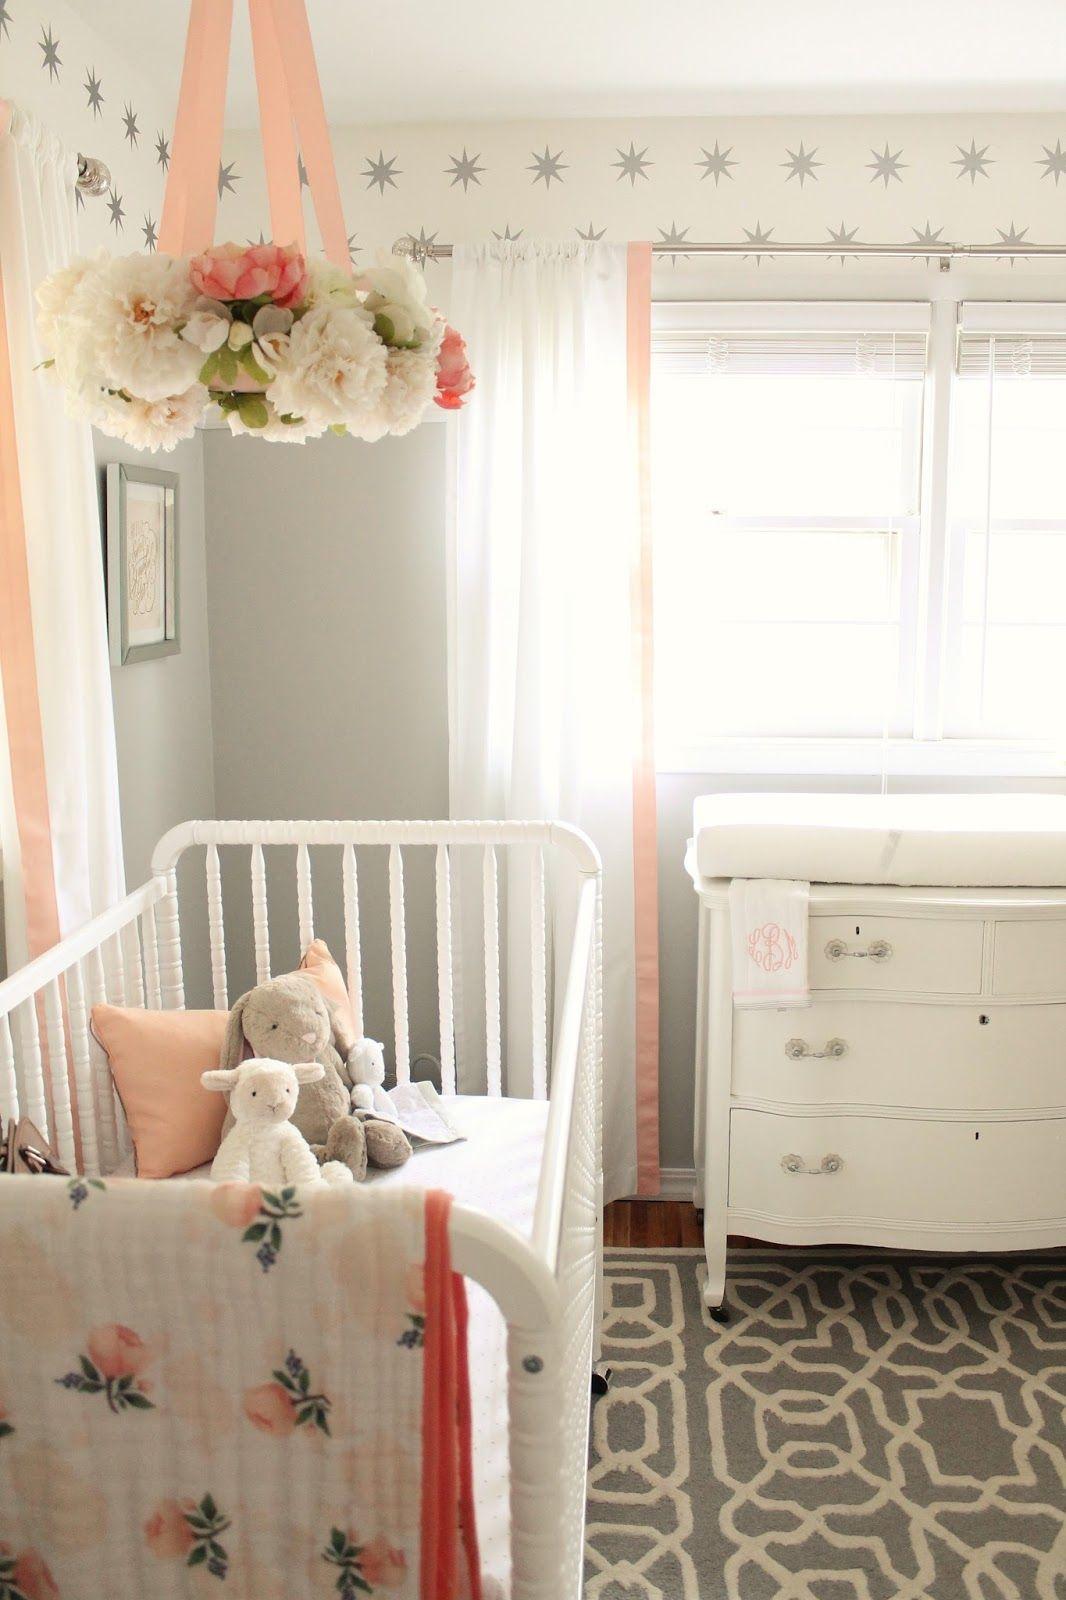 Peach And Gray Nursery Reveal My Home Blog Girl Nursery Baby Room Baby